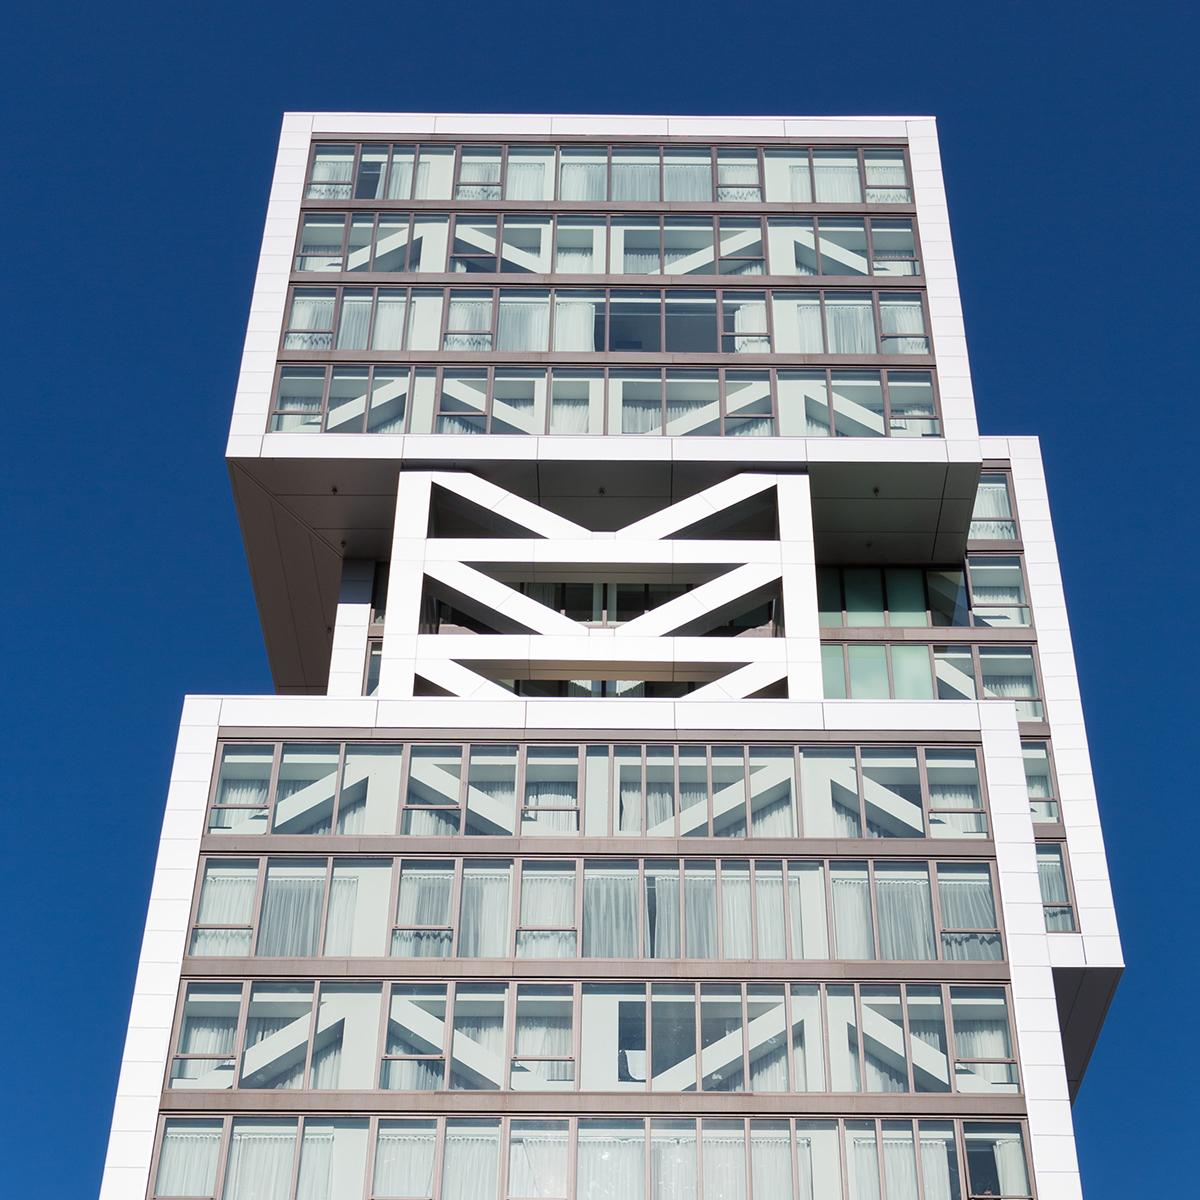 Tour Introduction: The Godfrey Hotel designed by Valerio Dewalt Train Associates